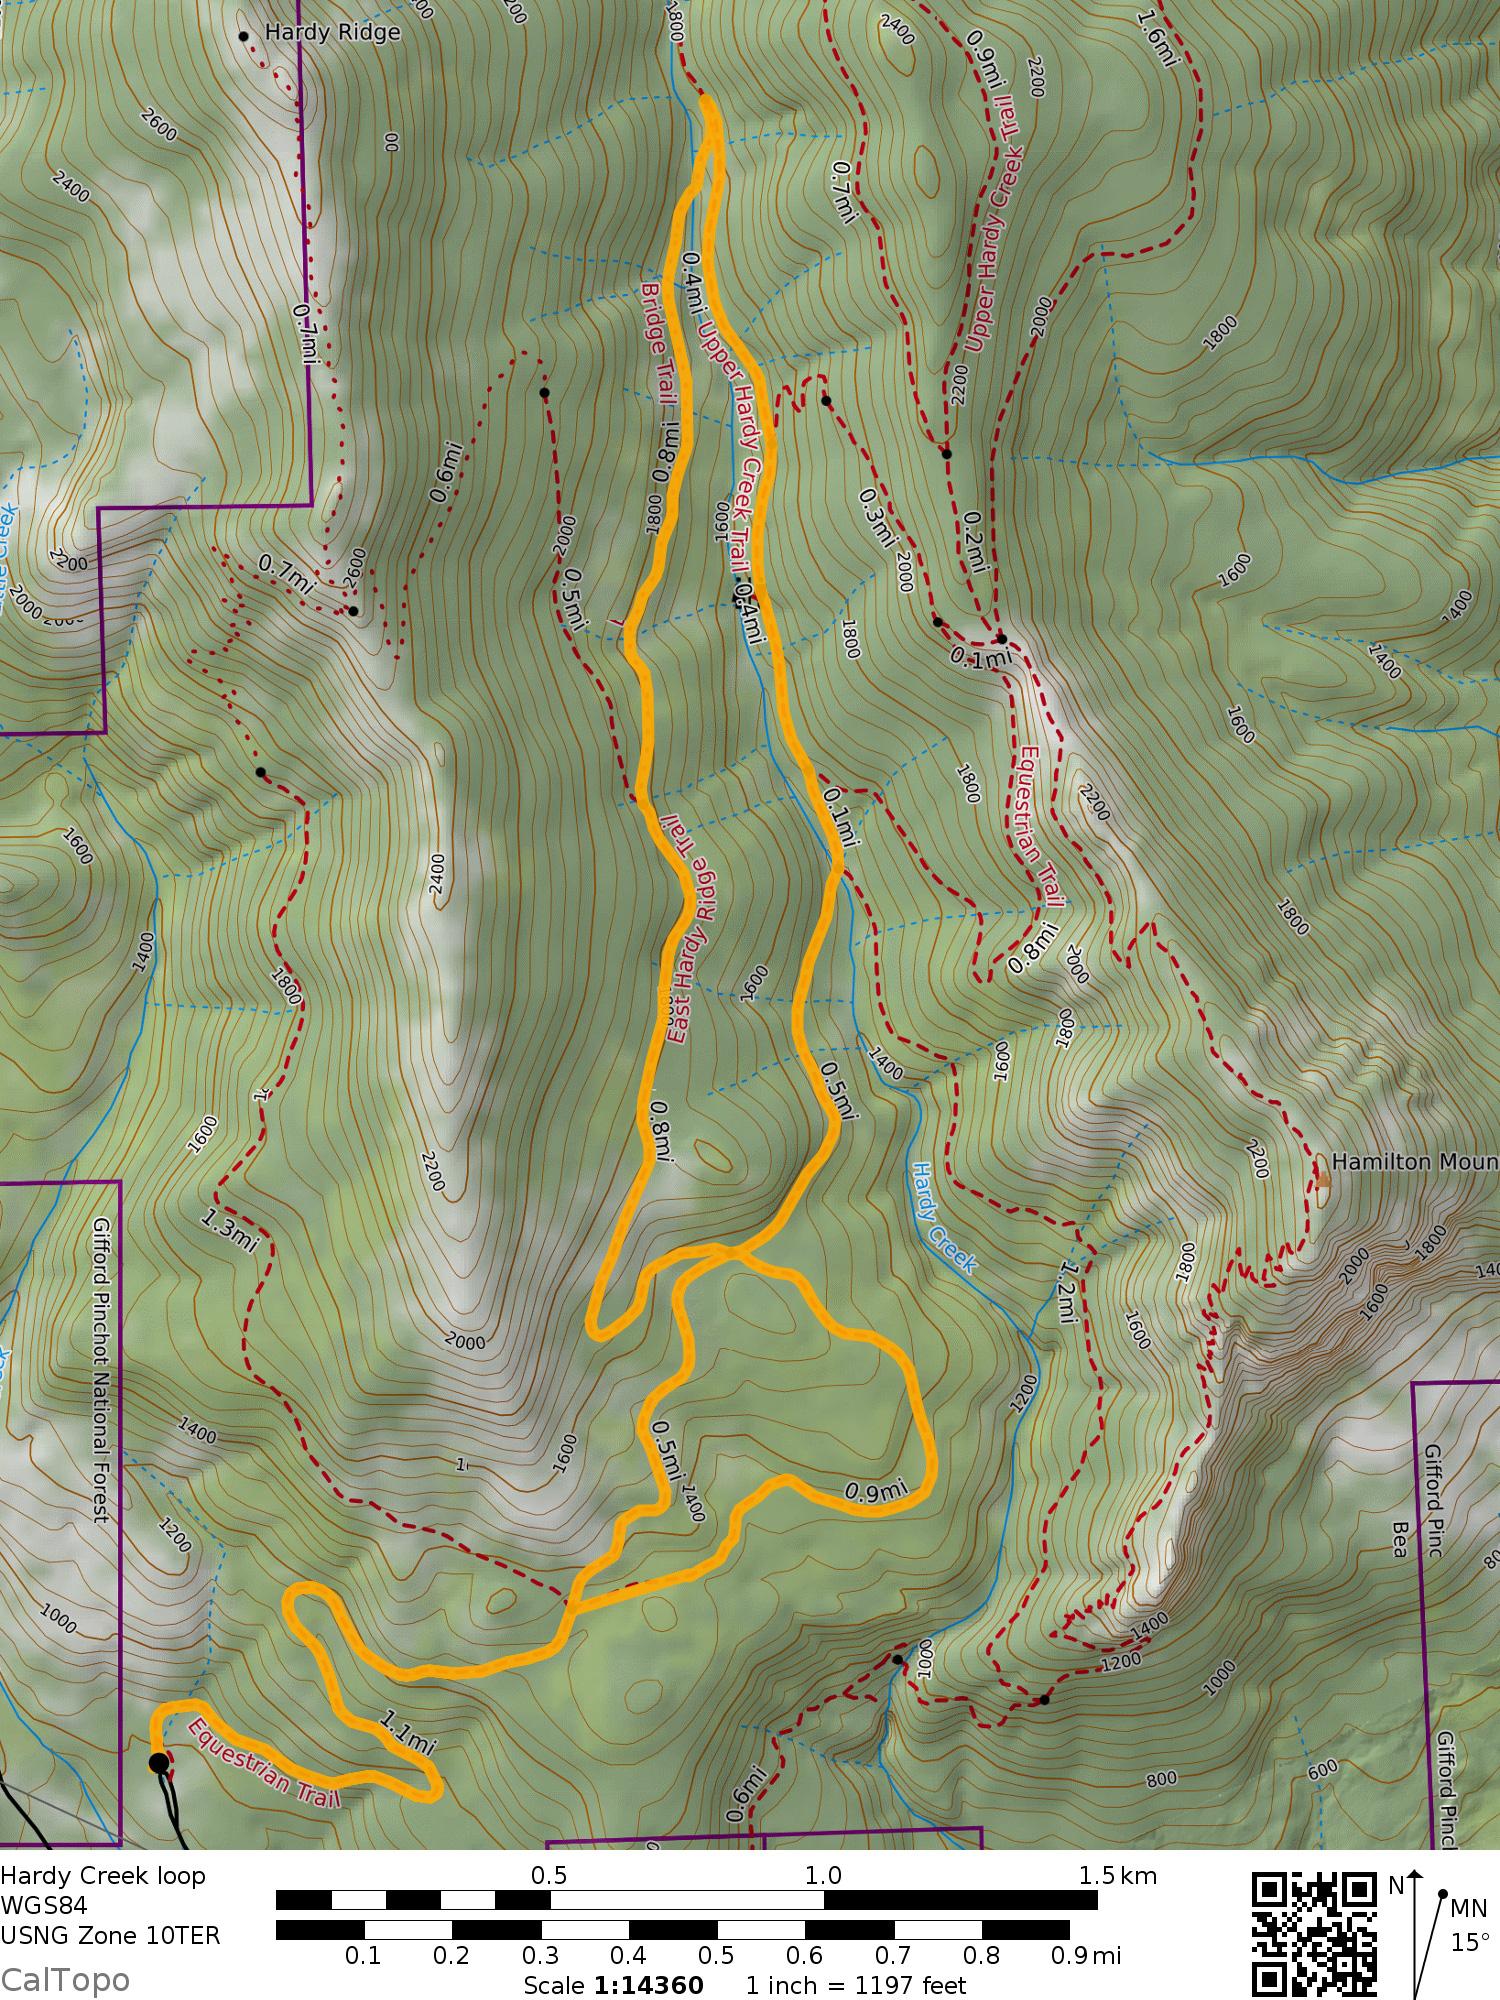 Hardy Creek loop map